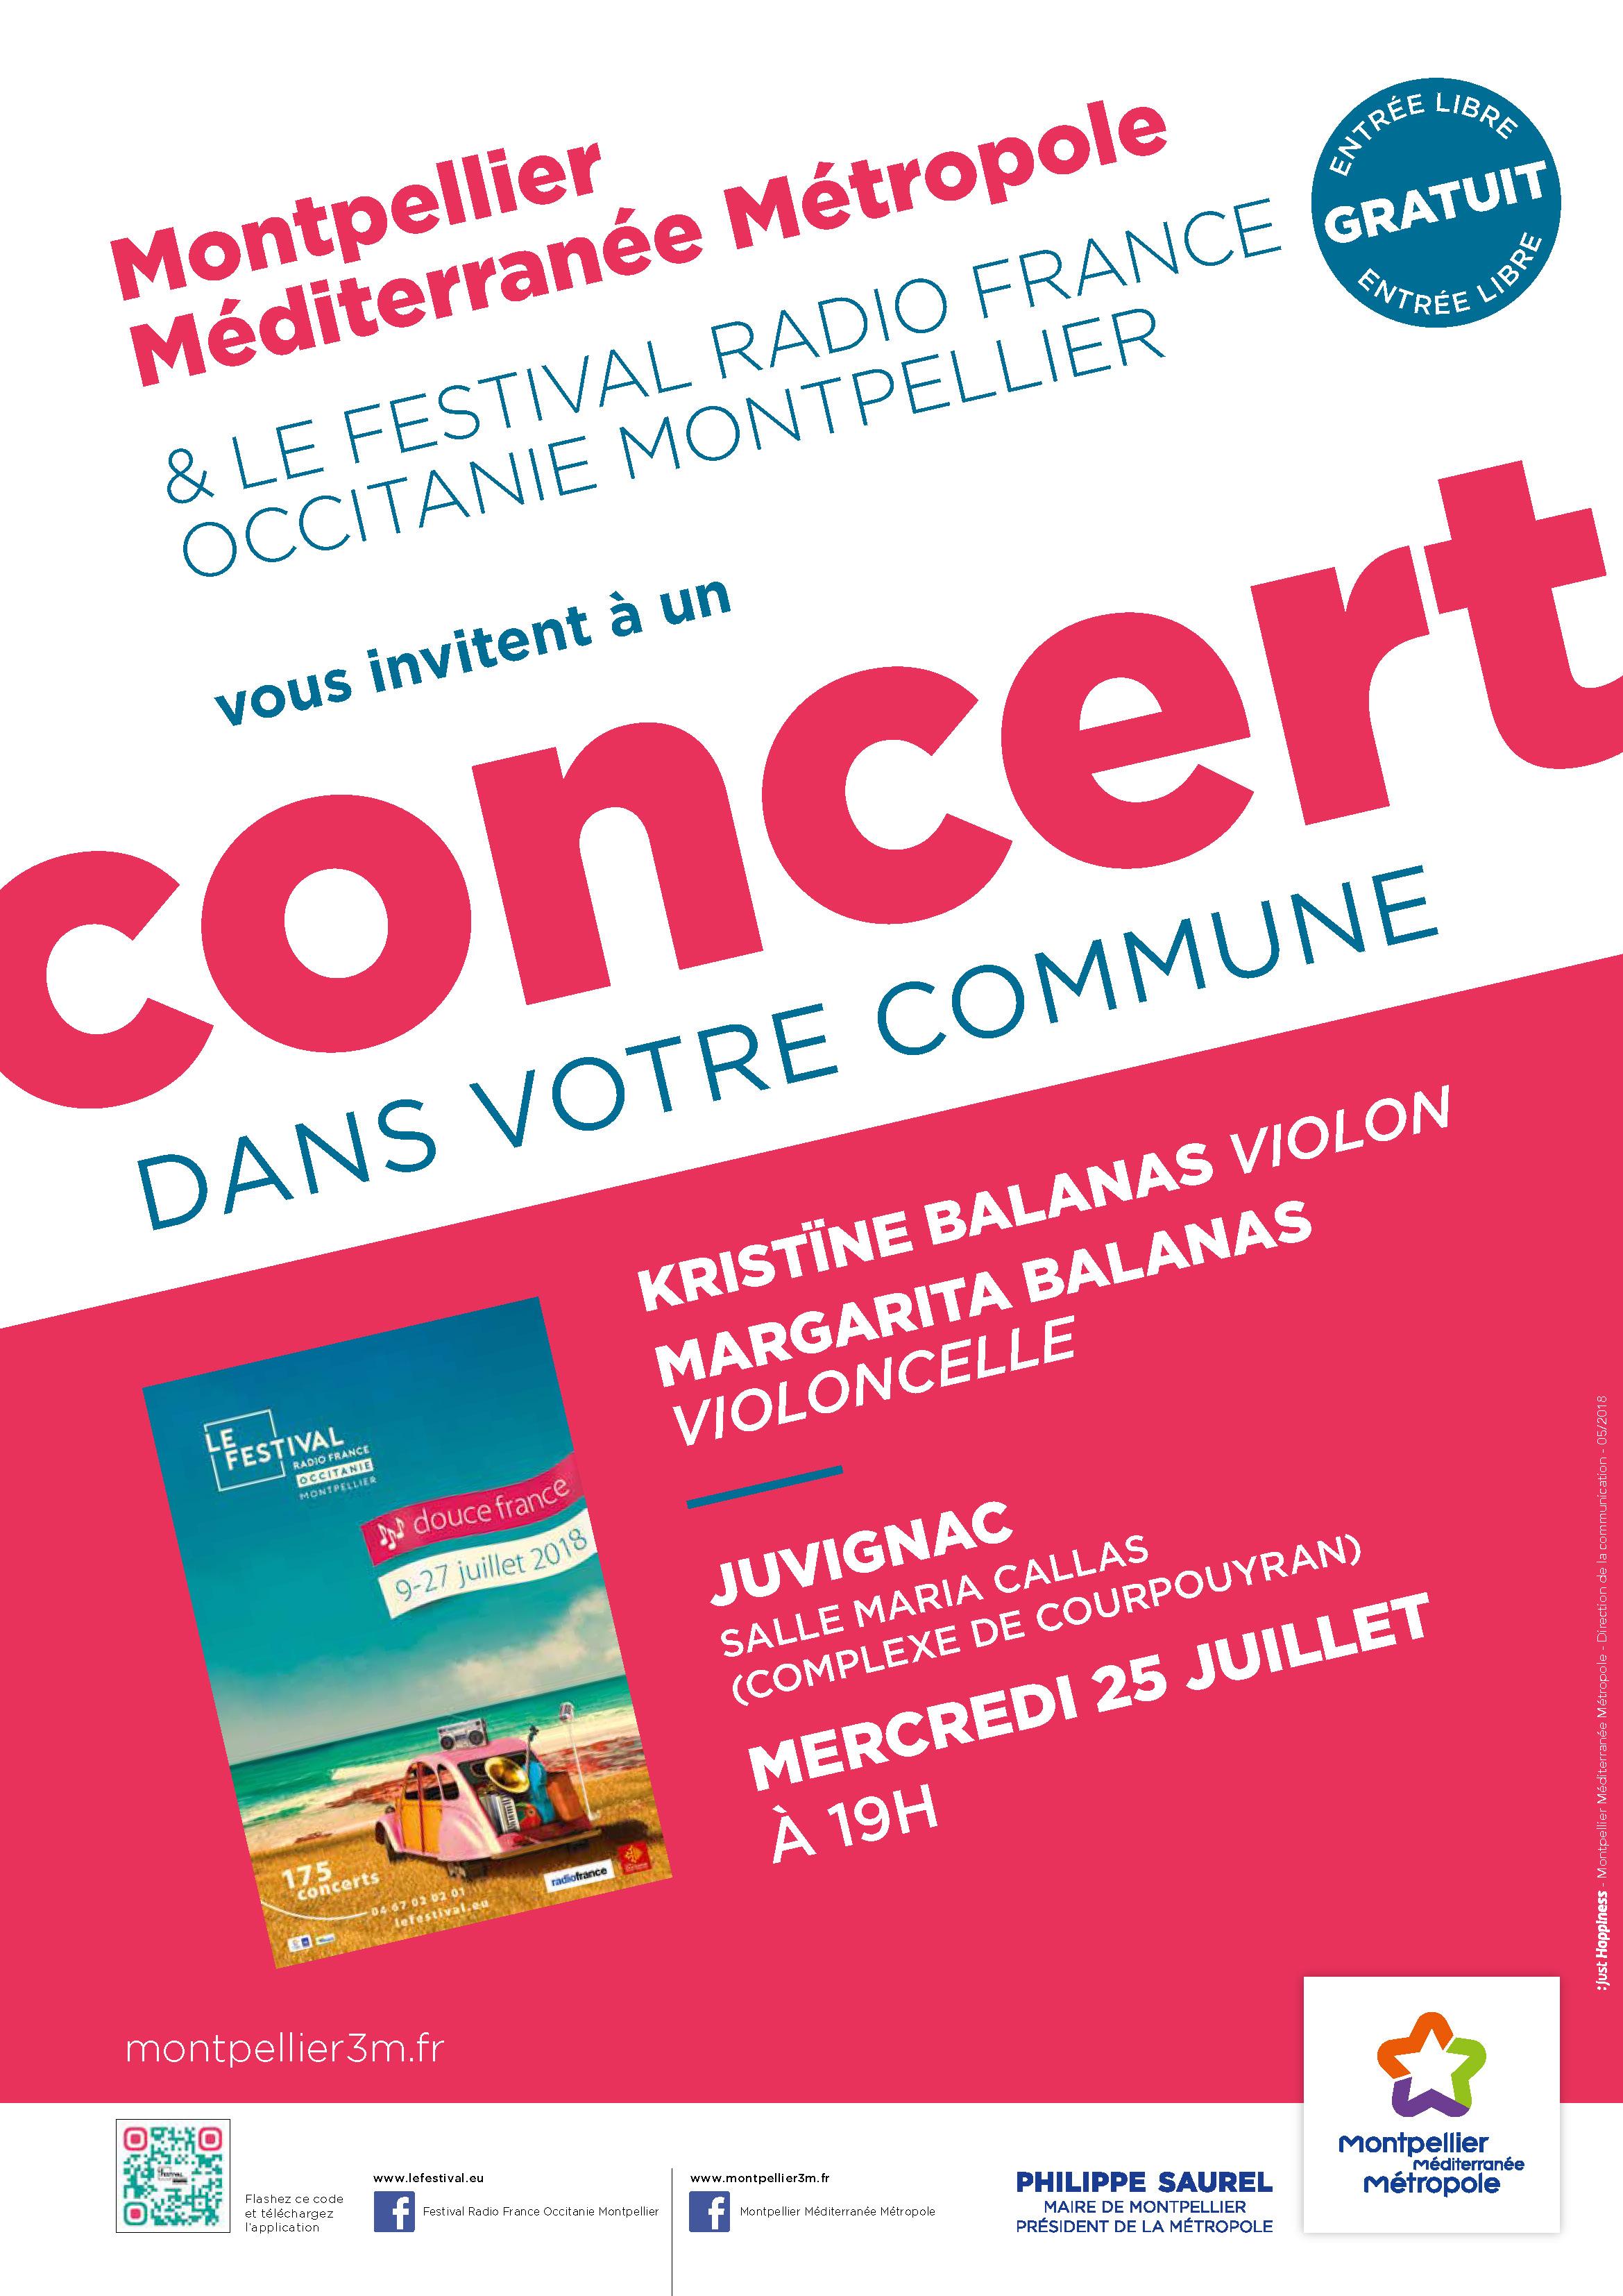 Festival Radio France Occitanie Montpellier | KRISTÏNE BALANAS et MARGARITA BALANAS